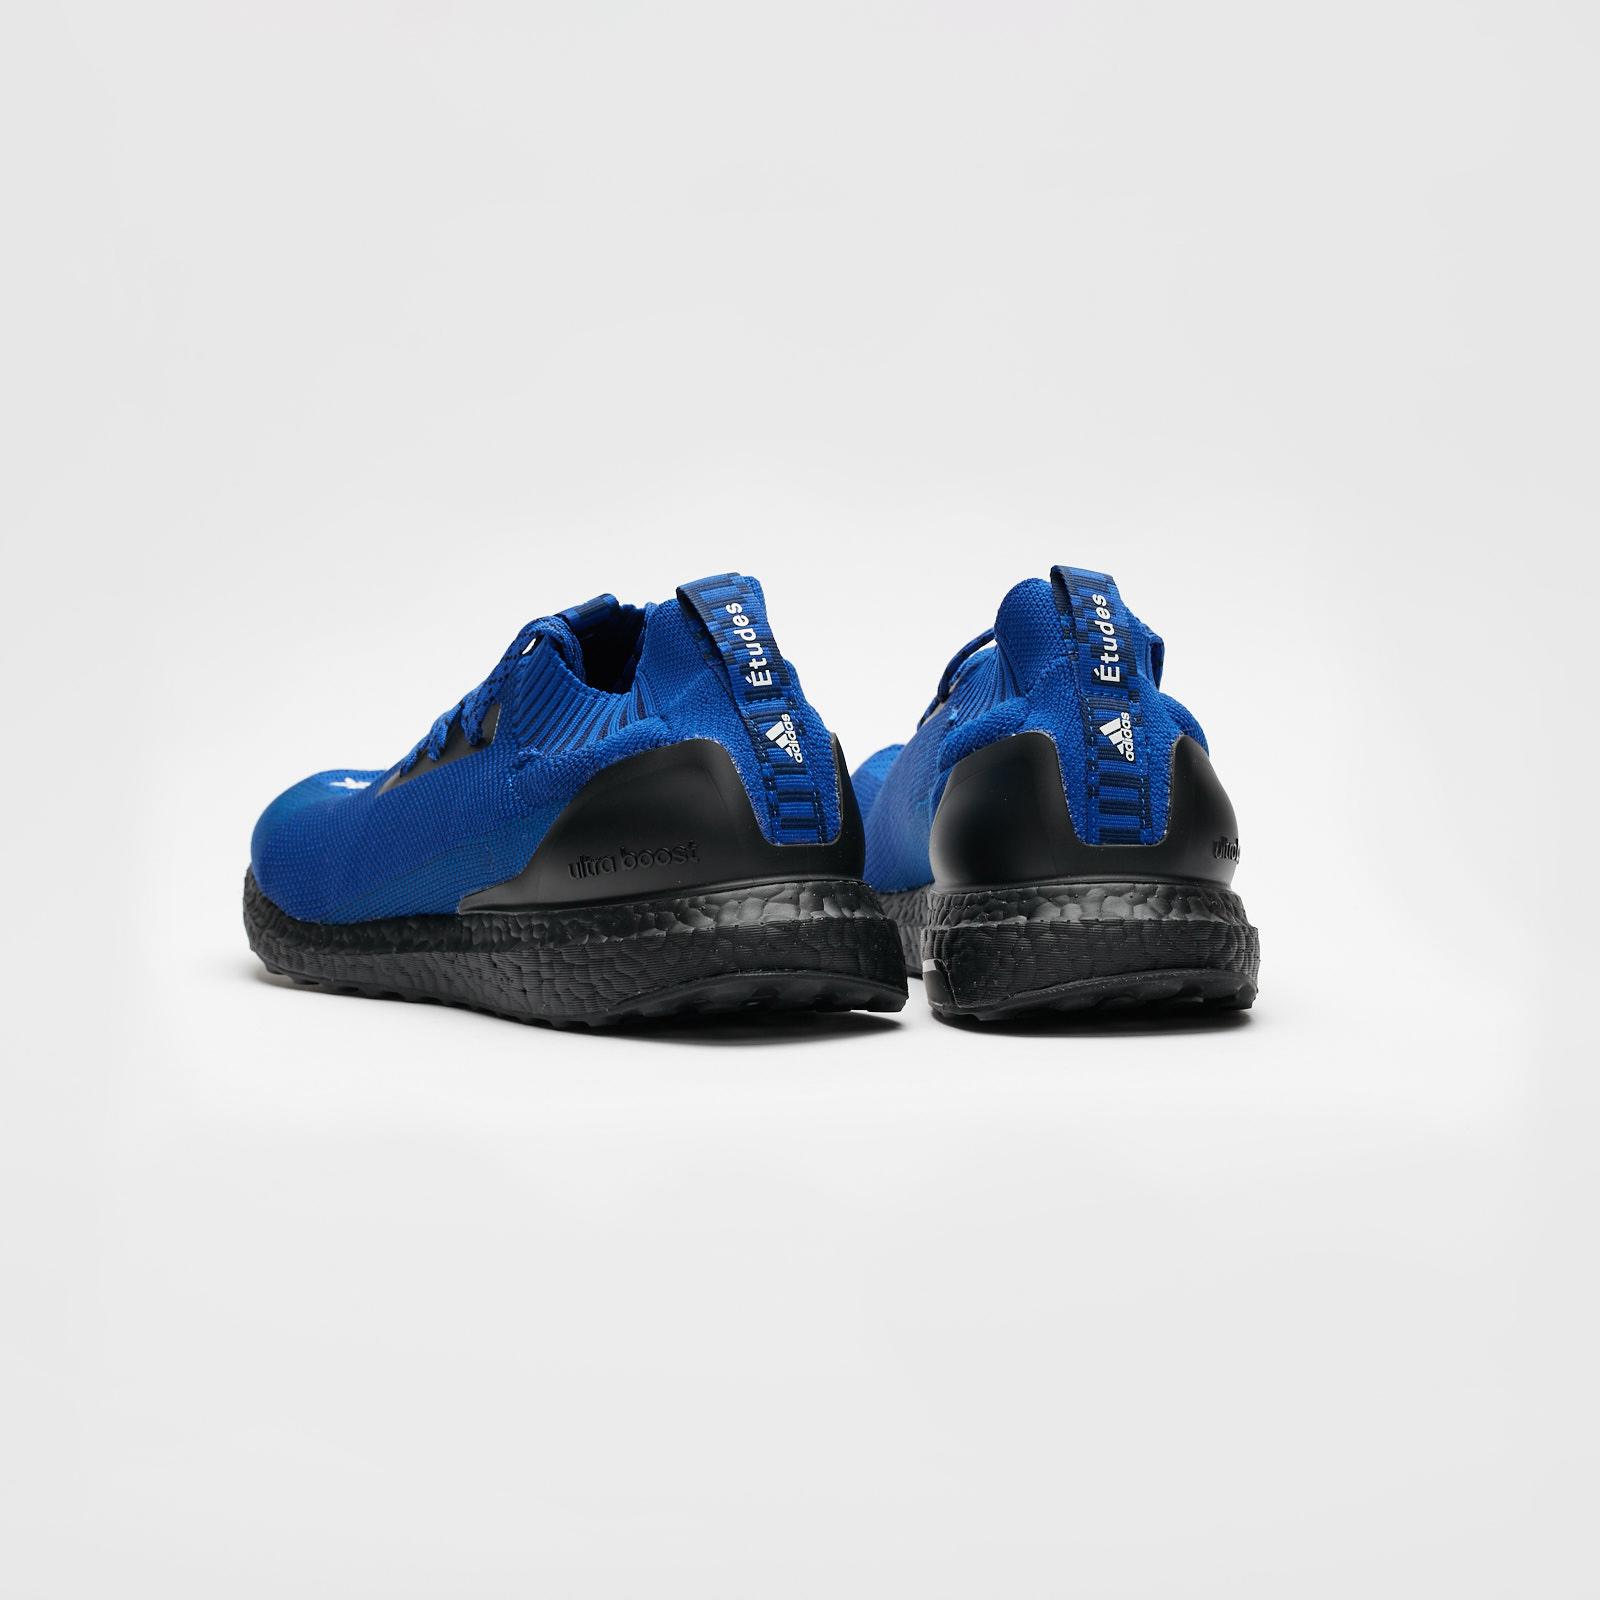 buy popular 7b708 6d9b2 adidas UltraBOOST x Études - D97732 - Sneakersnstuff ...